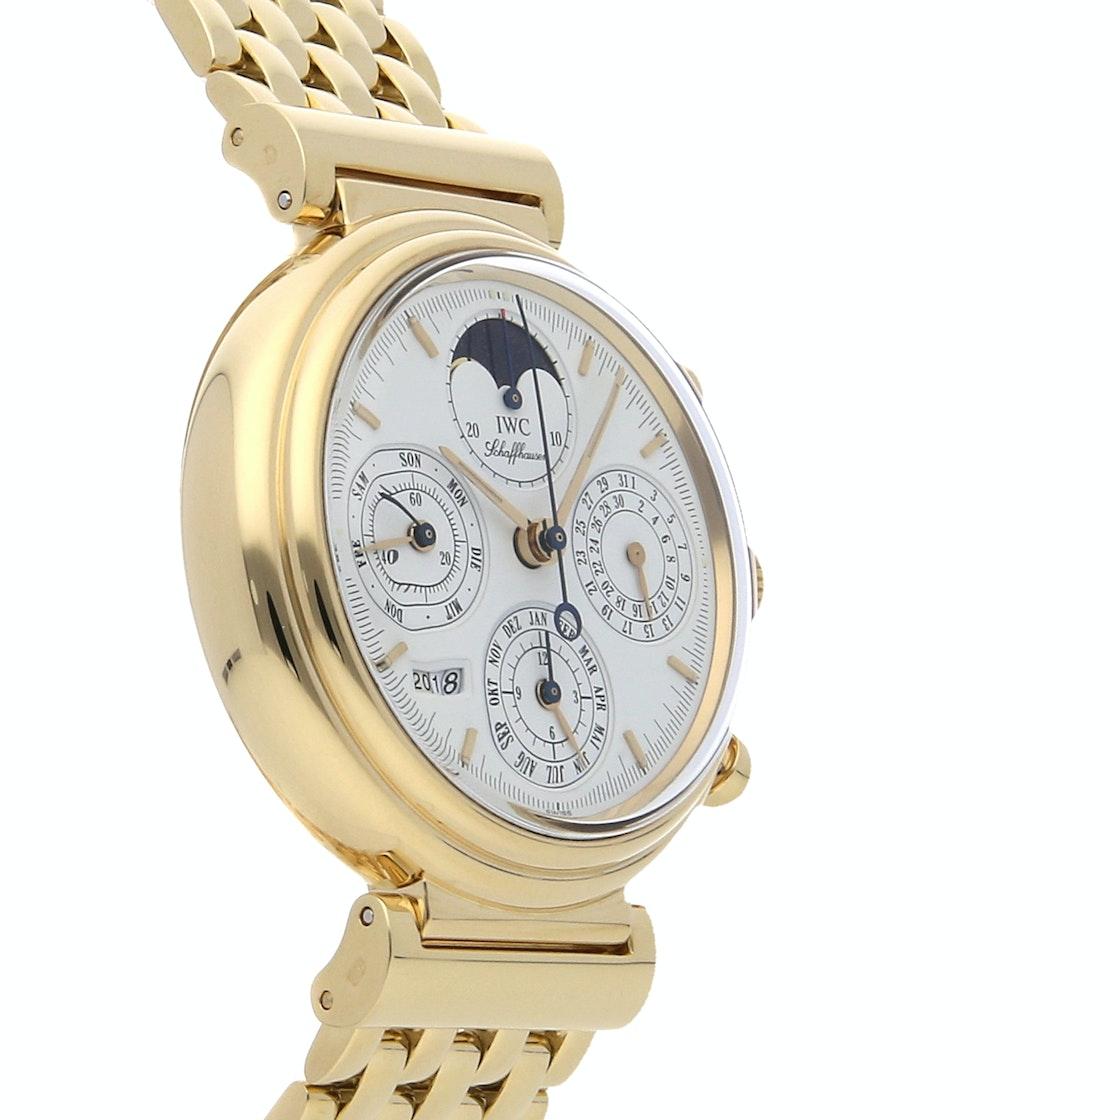 IWC Da Vinci Perpetual Calendar Chronograph IW9252-01